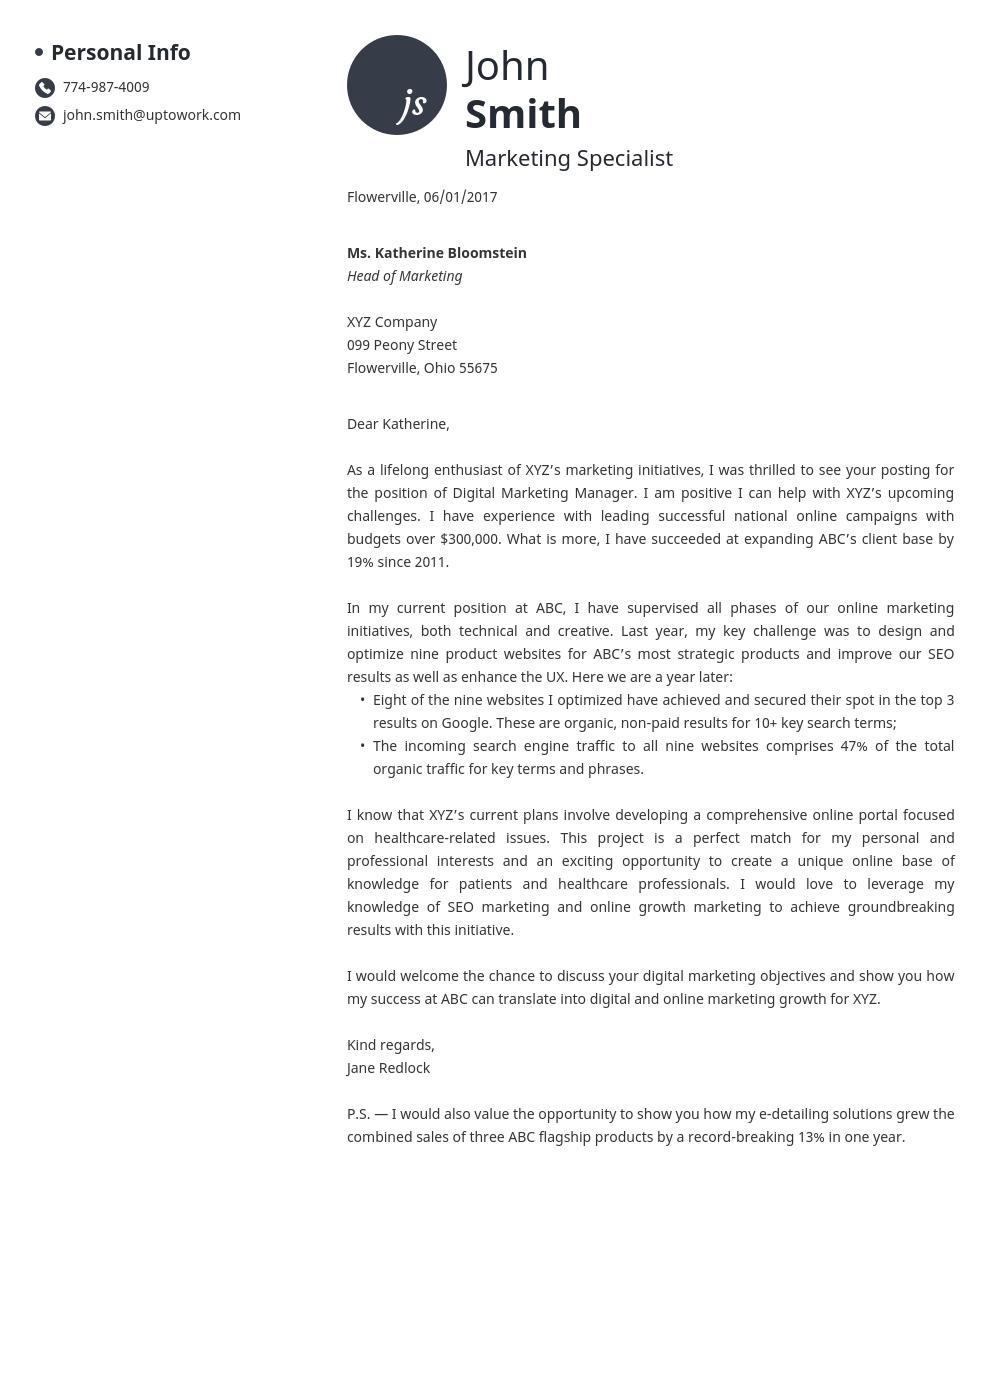 cover letter builder online  get a cover letter in 10